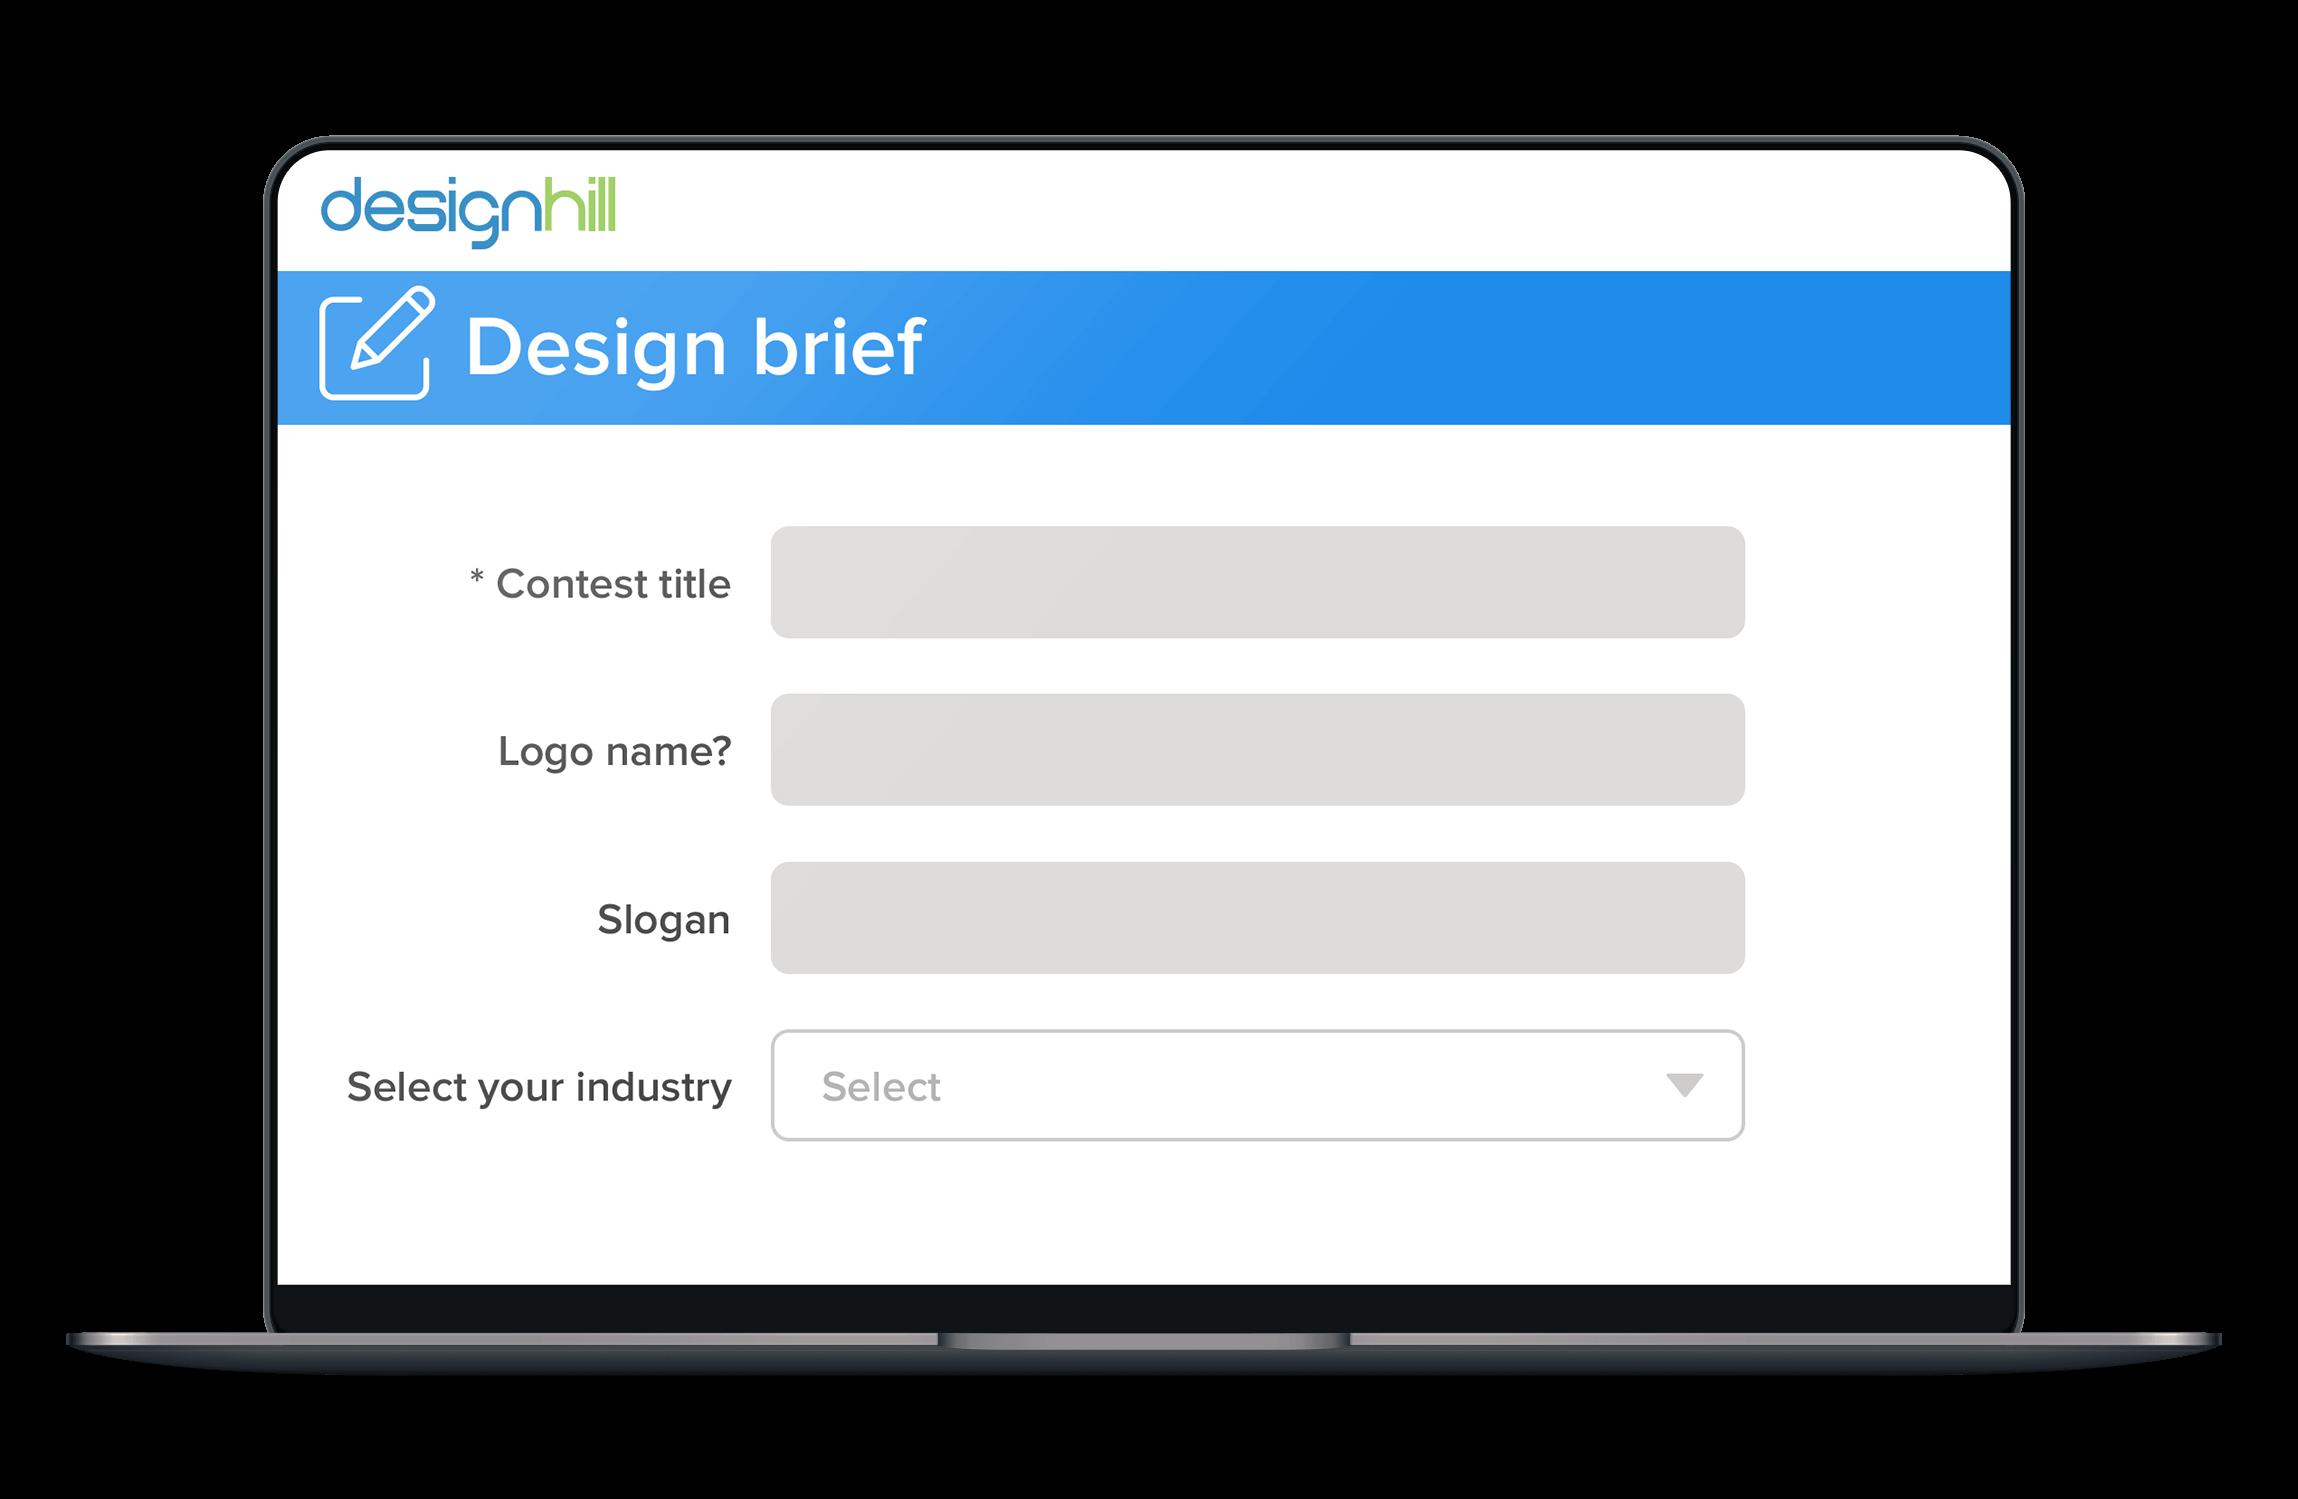 Need a Design? Launch a Design Contest Now - Designhill